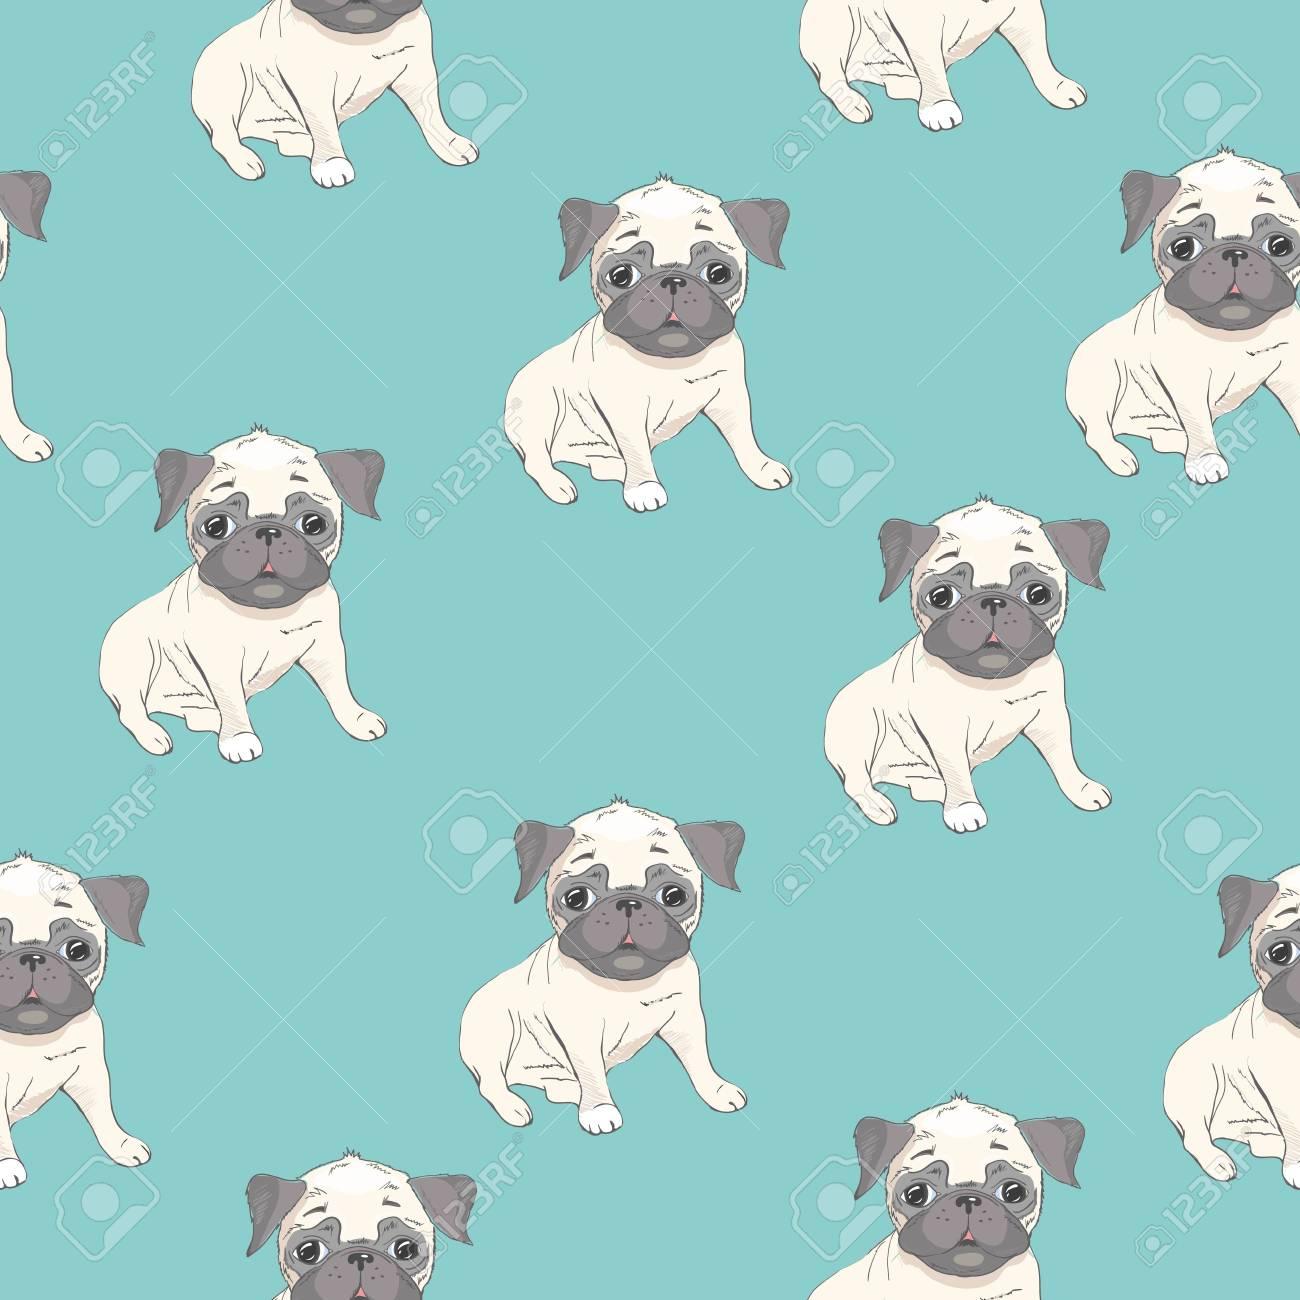 11 Cartoon Puppy Wallpapers On Wallpapersafari